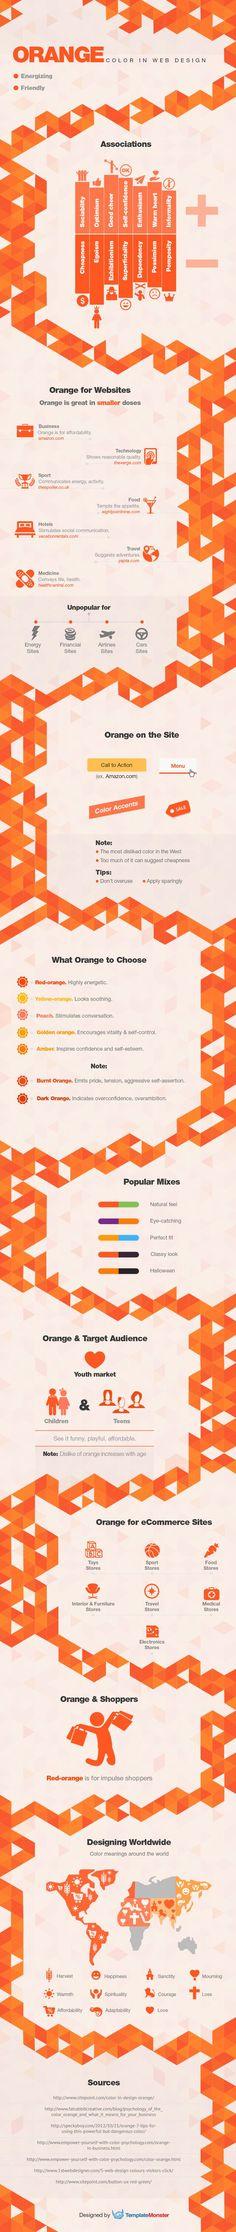 Orange Color in Web Design [Infographics]